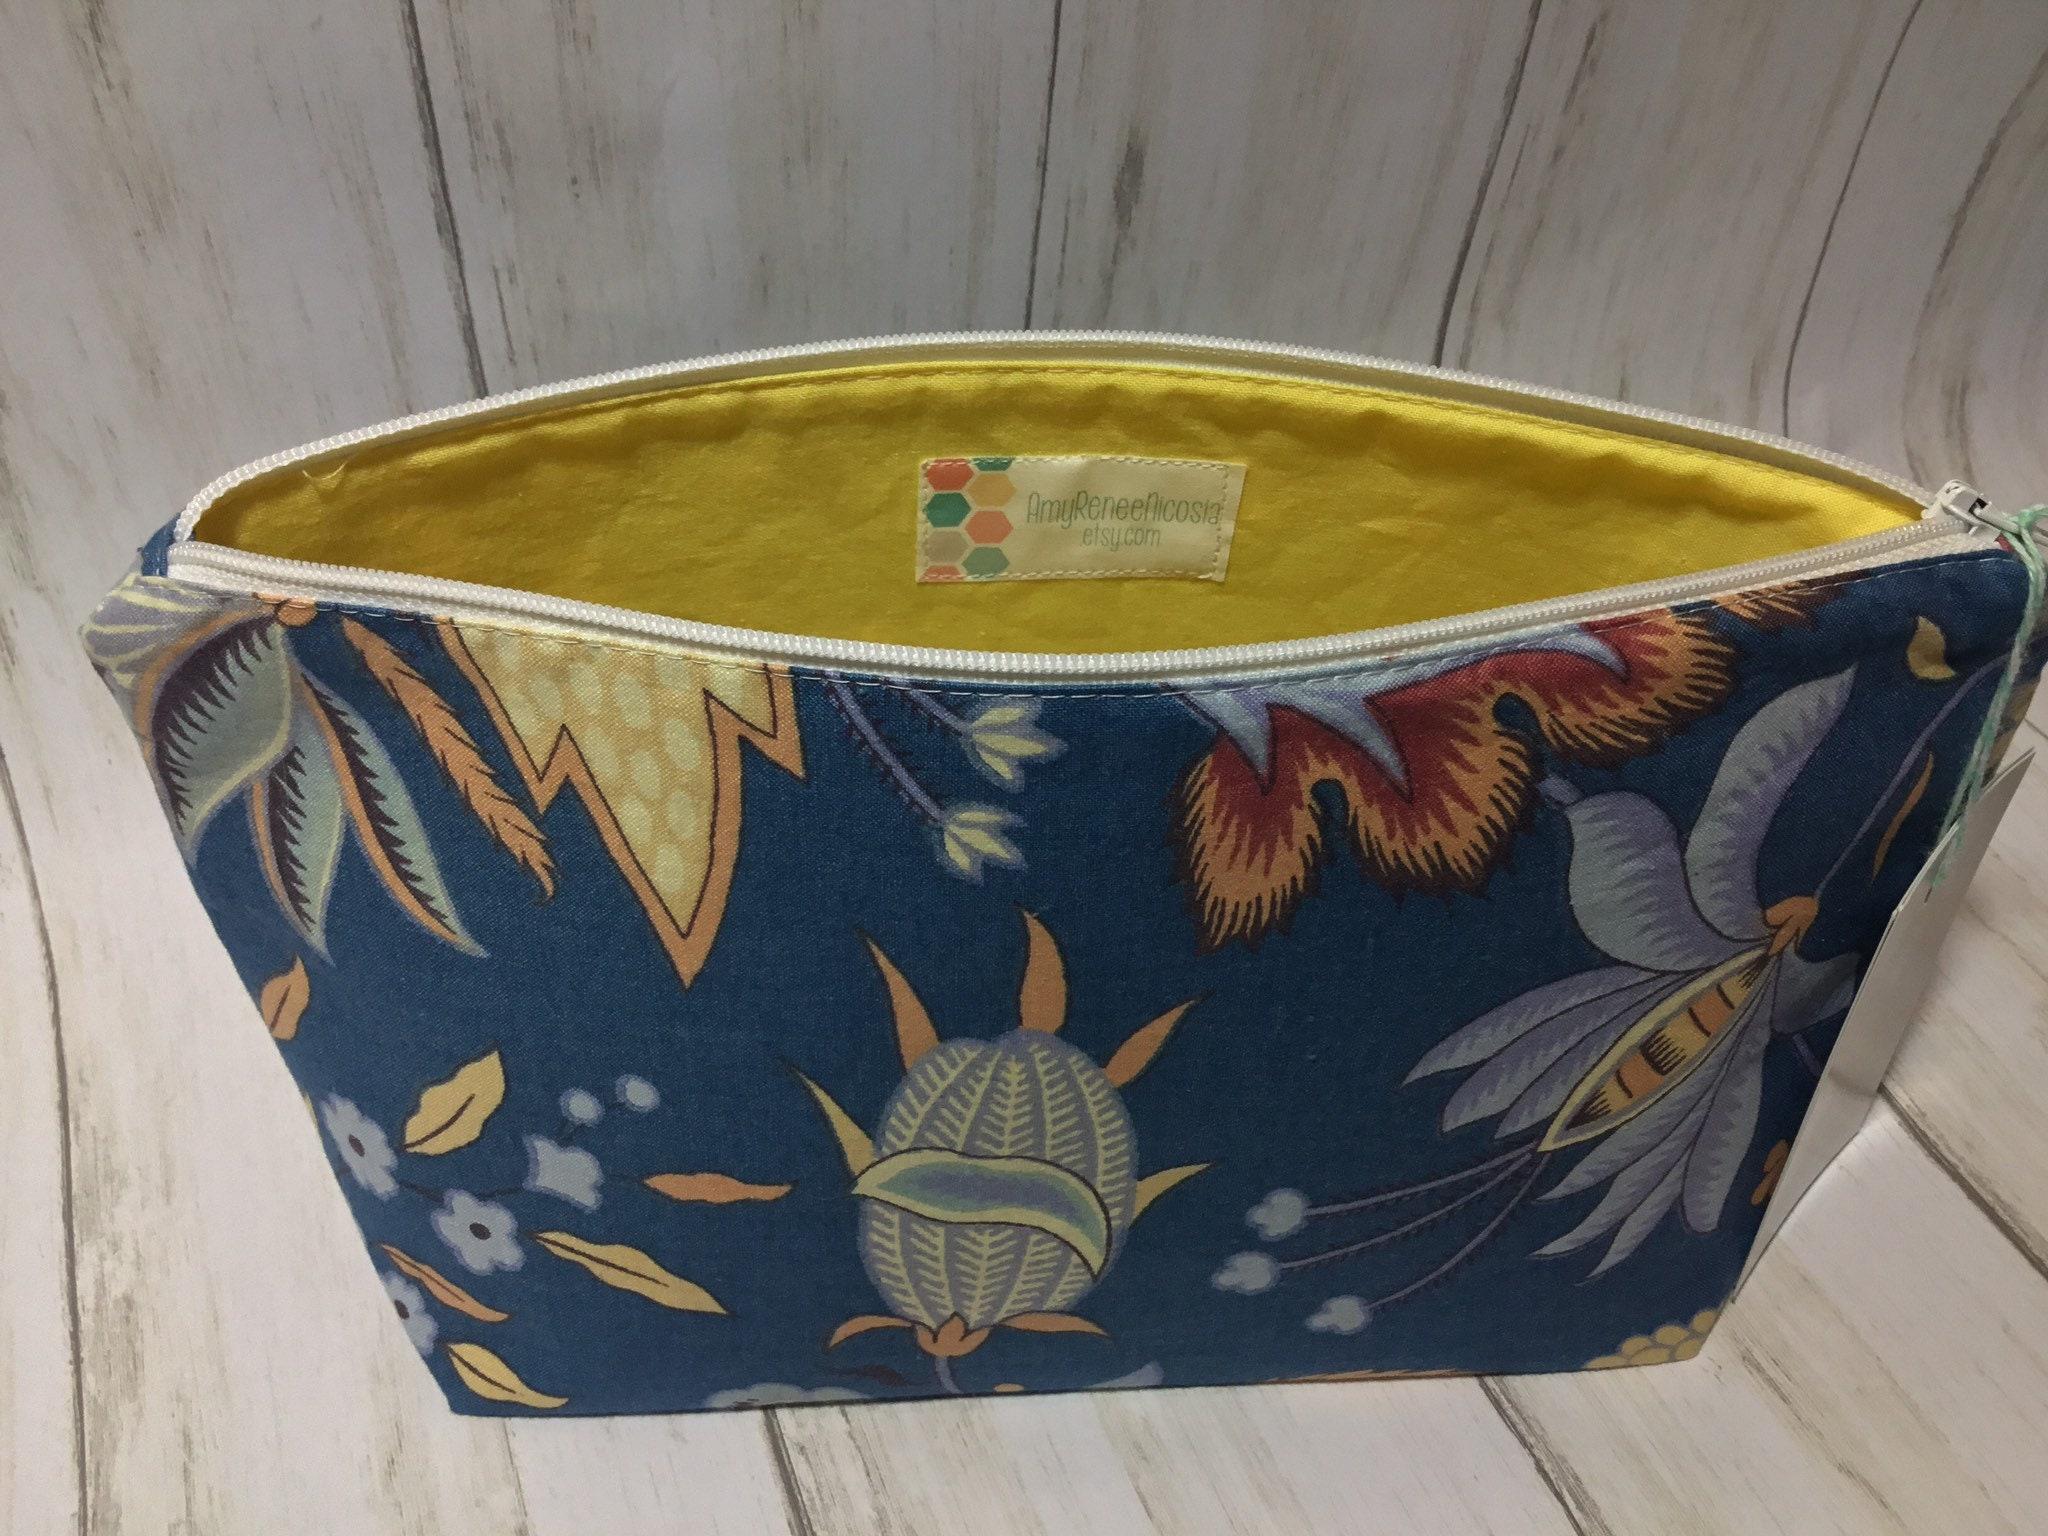 dee9449fa08 Makeup Bag Yellow and Blue Handmade Cosmetic Bag Toiletry Bag Make Up Bag  Medium Sized Make Up Pouch Flat Bottom Monogrammed Bag